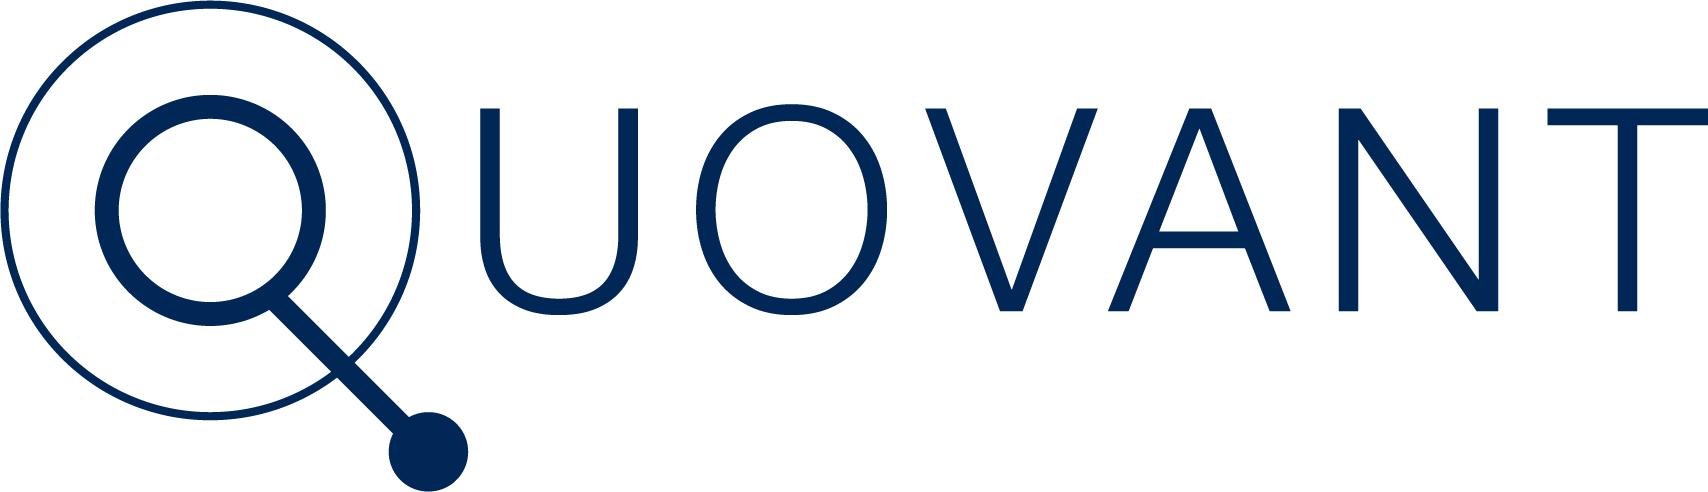 Quovant Company Logo